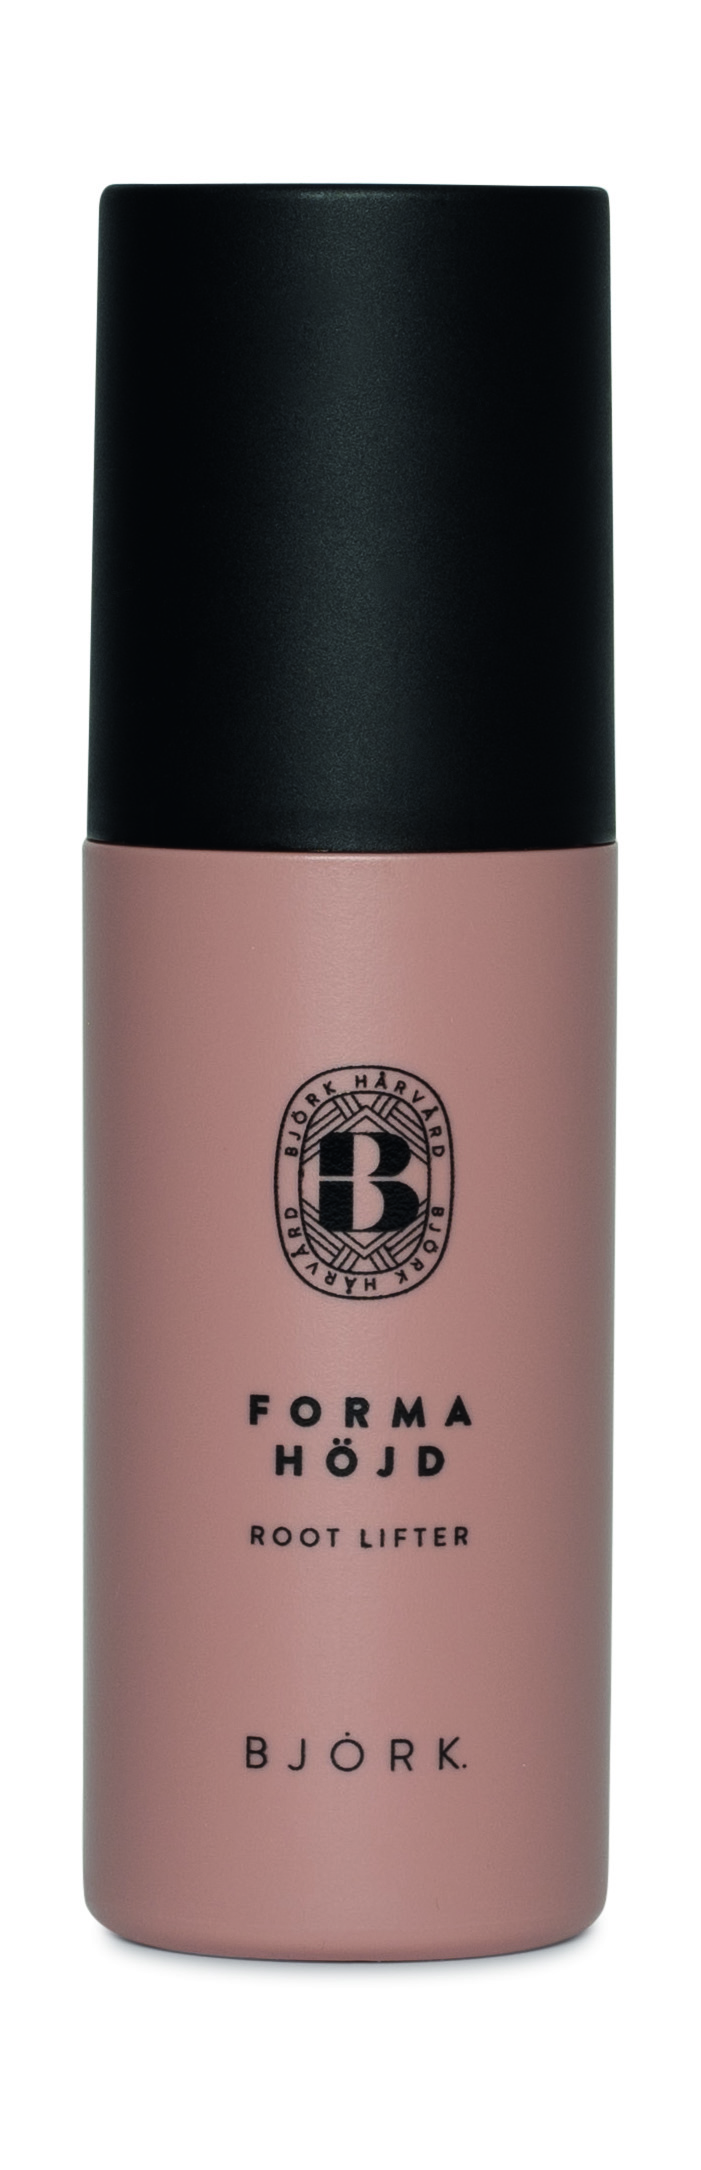 bjork-forma-hojd-150ml-1505-121-0150_1